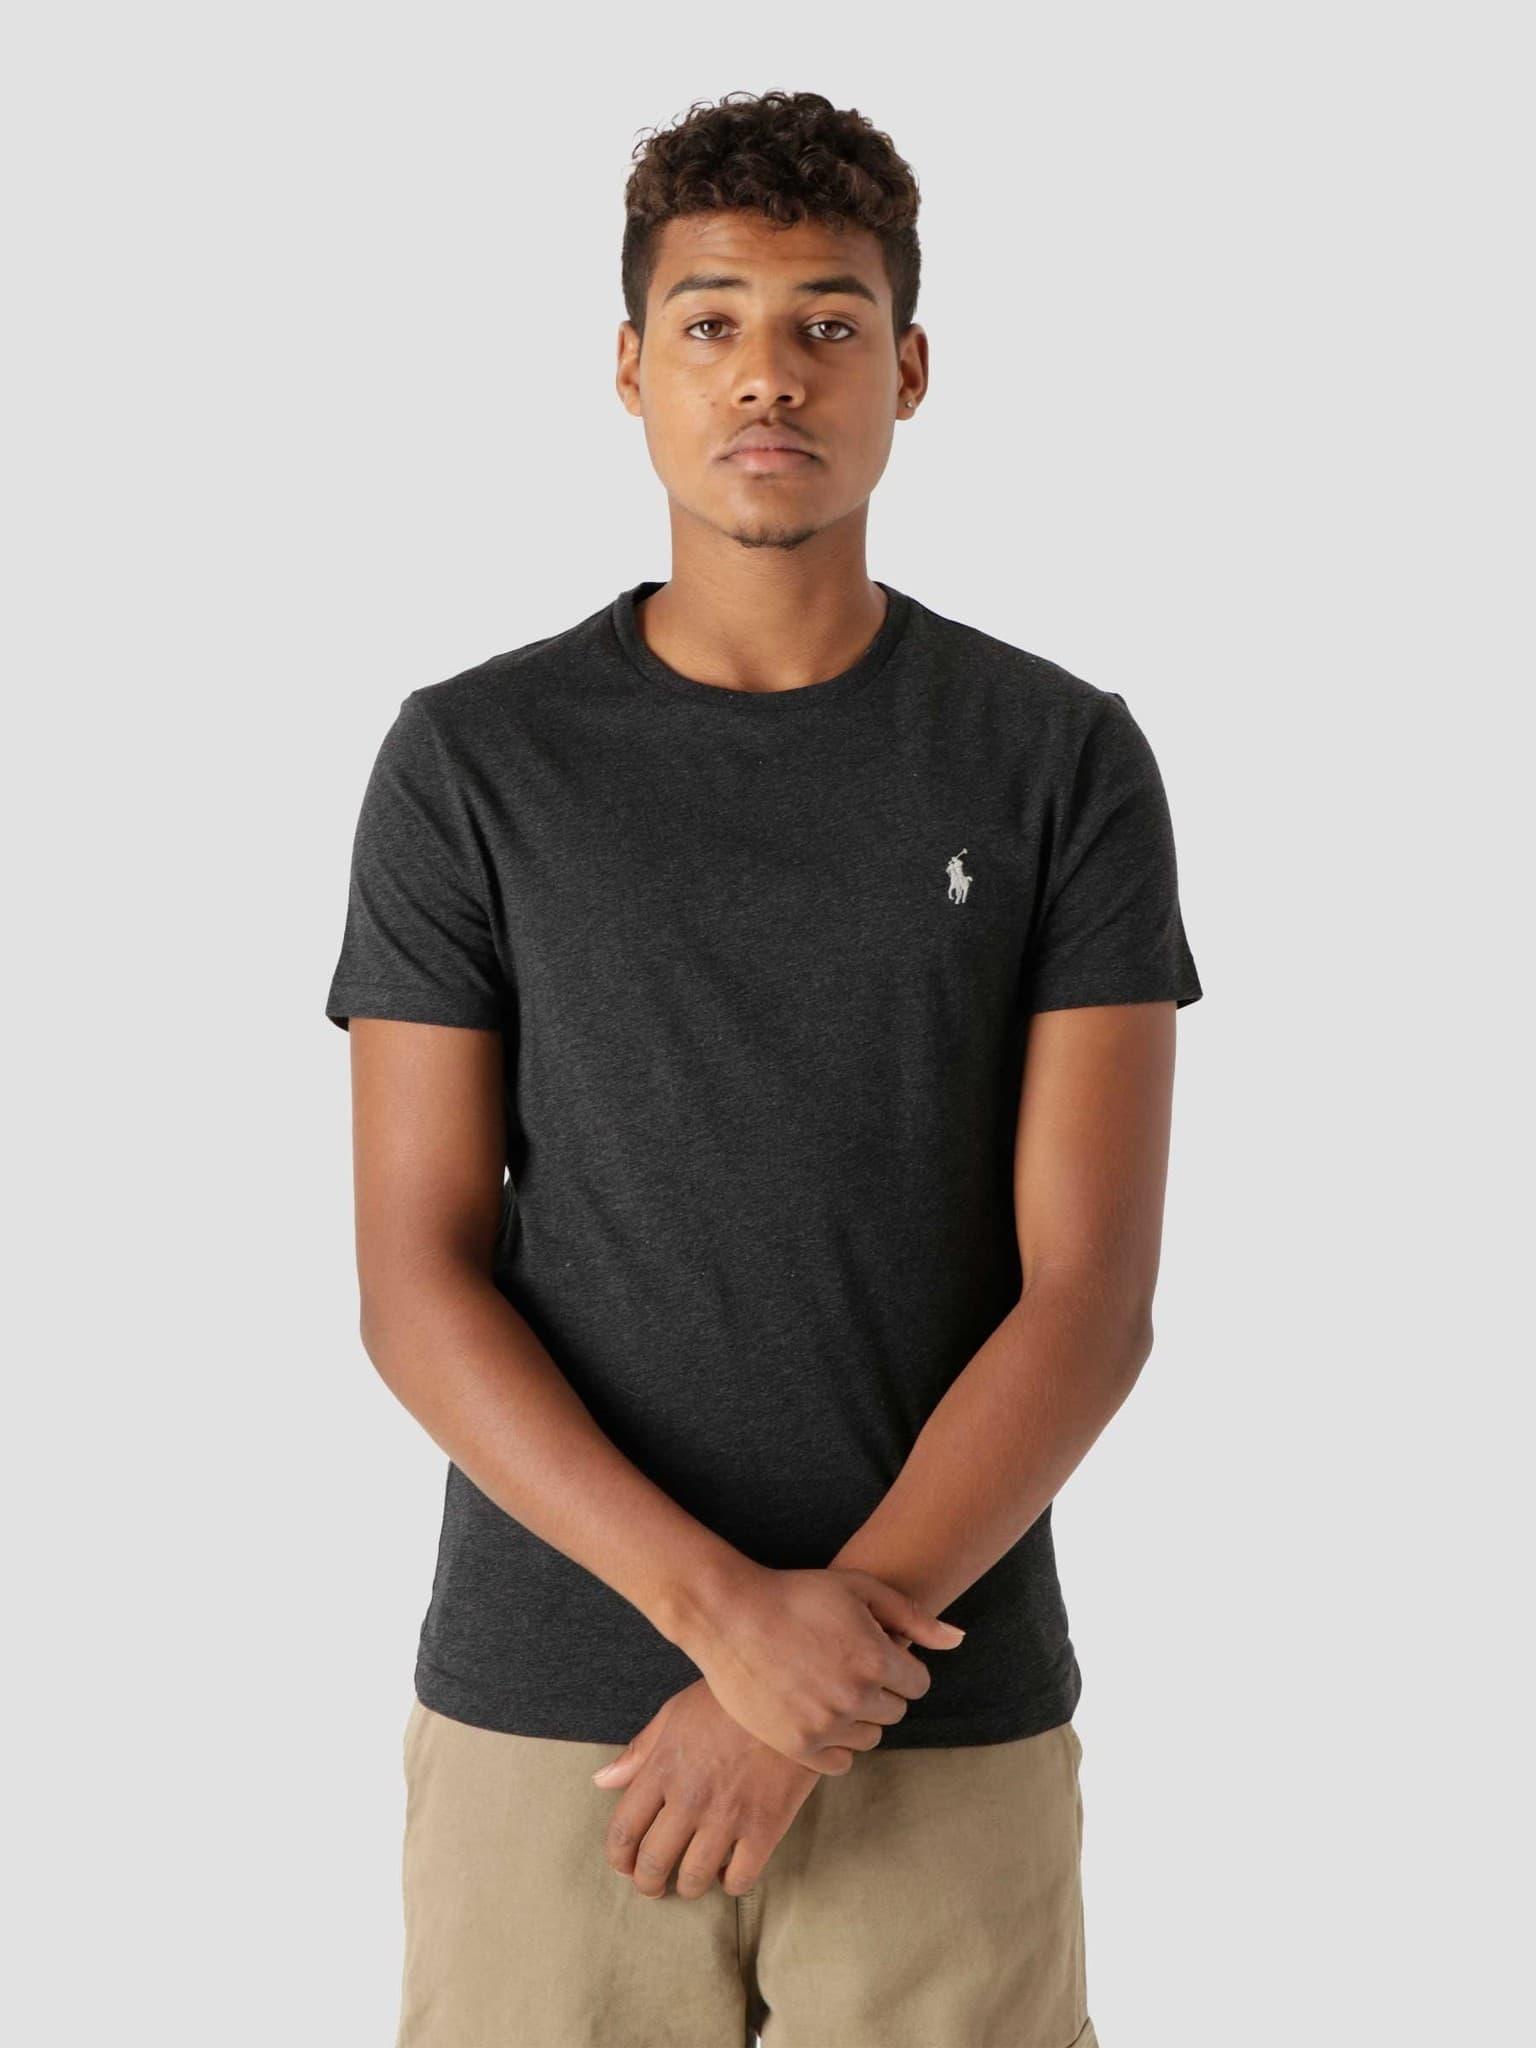 T-Shirt Black Marl Heather-C9590 710671438164